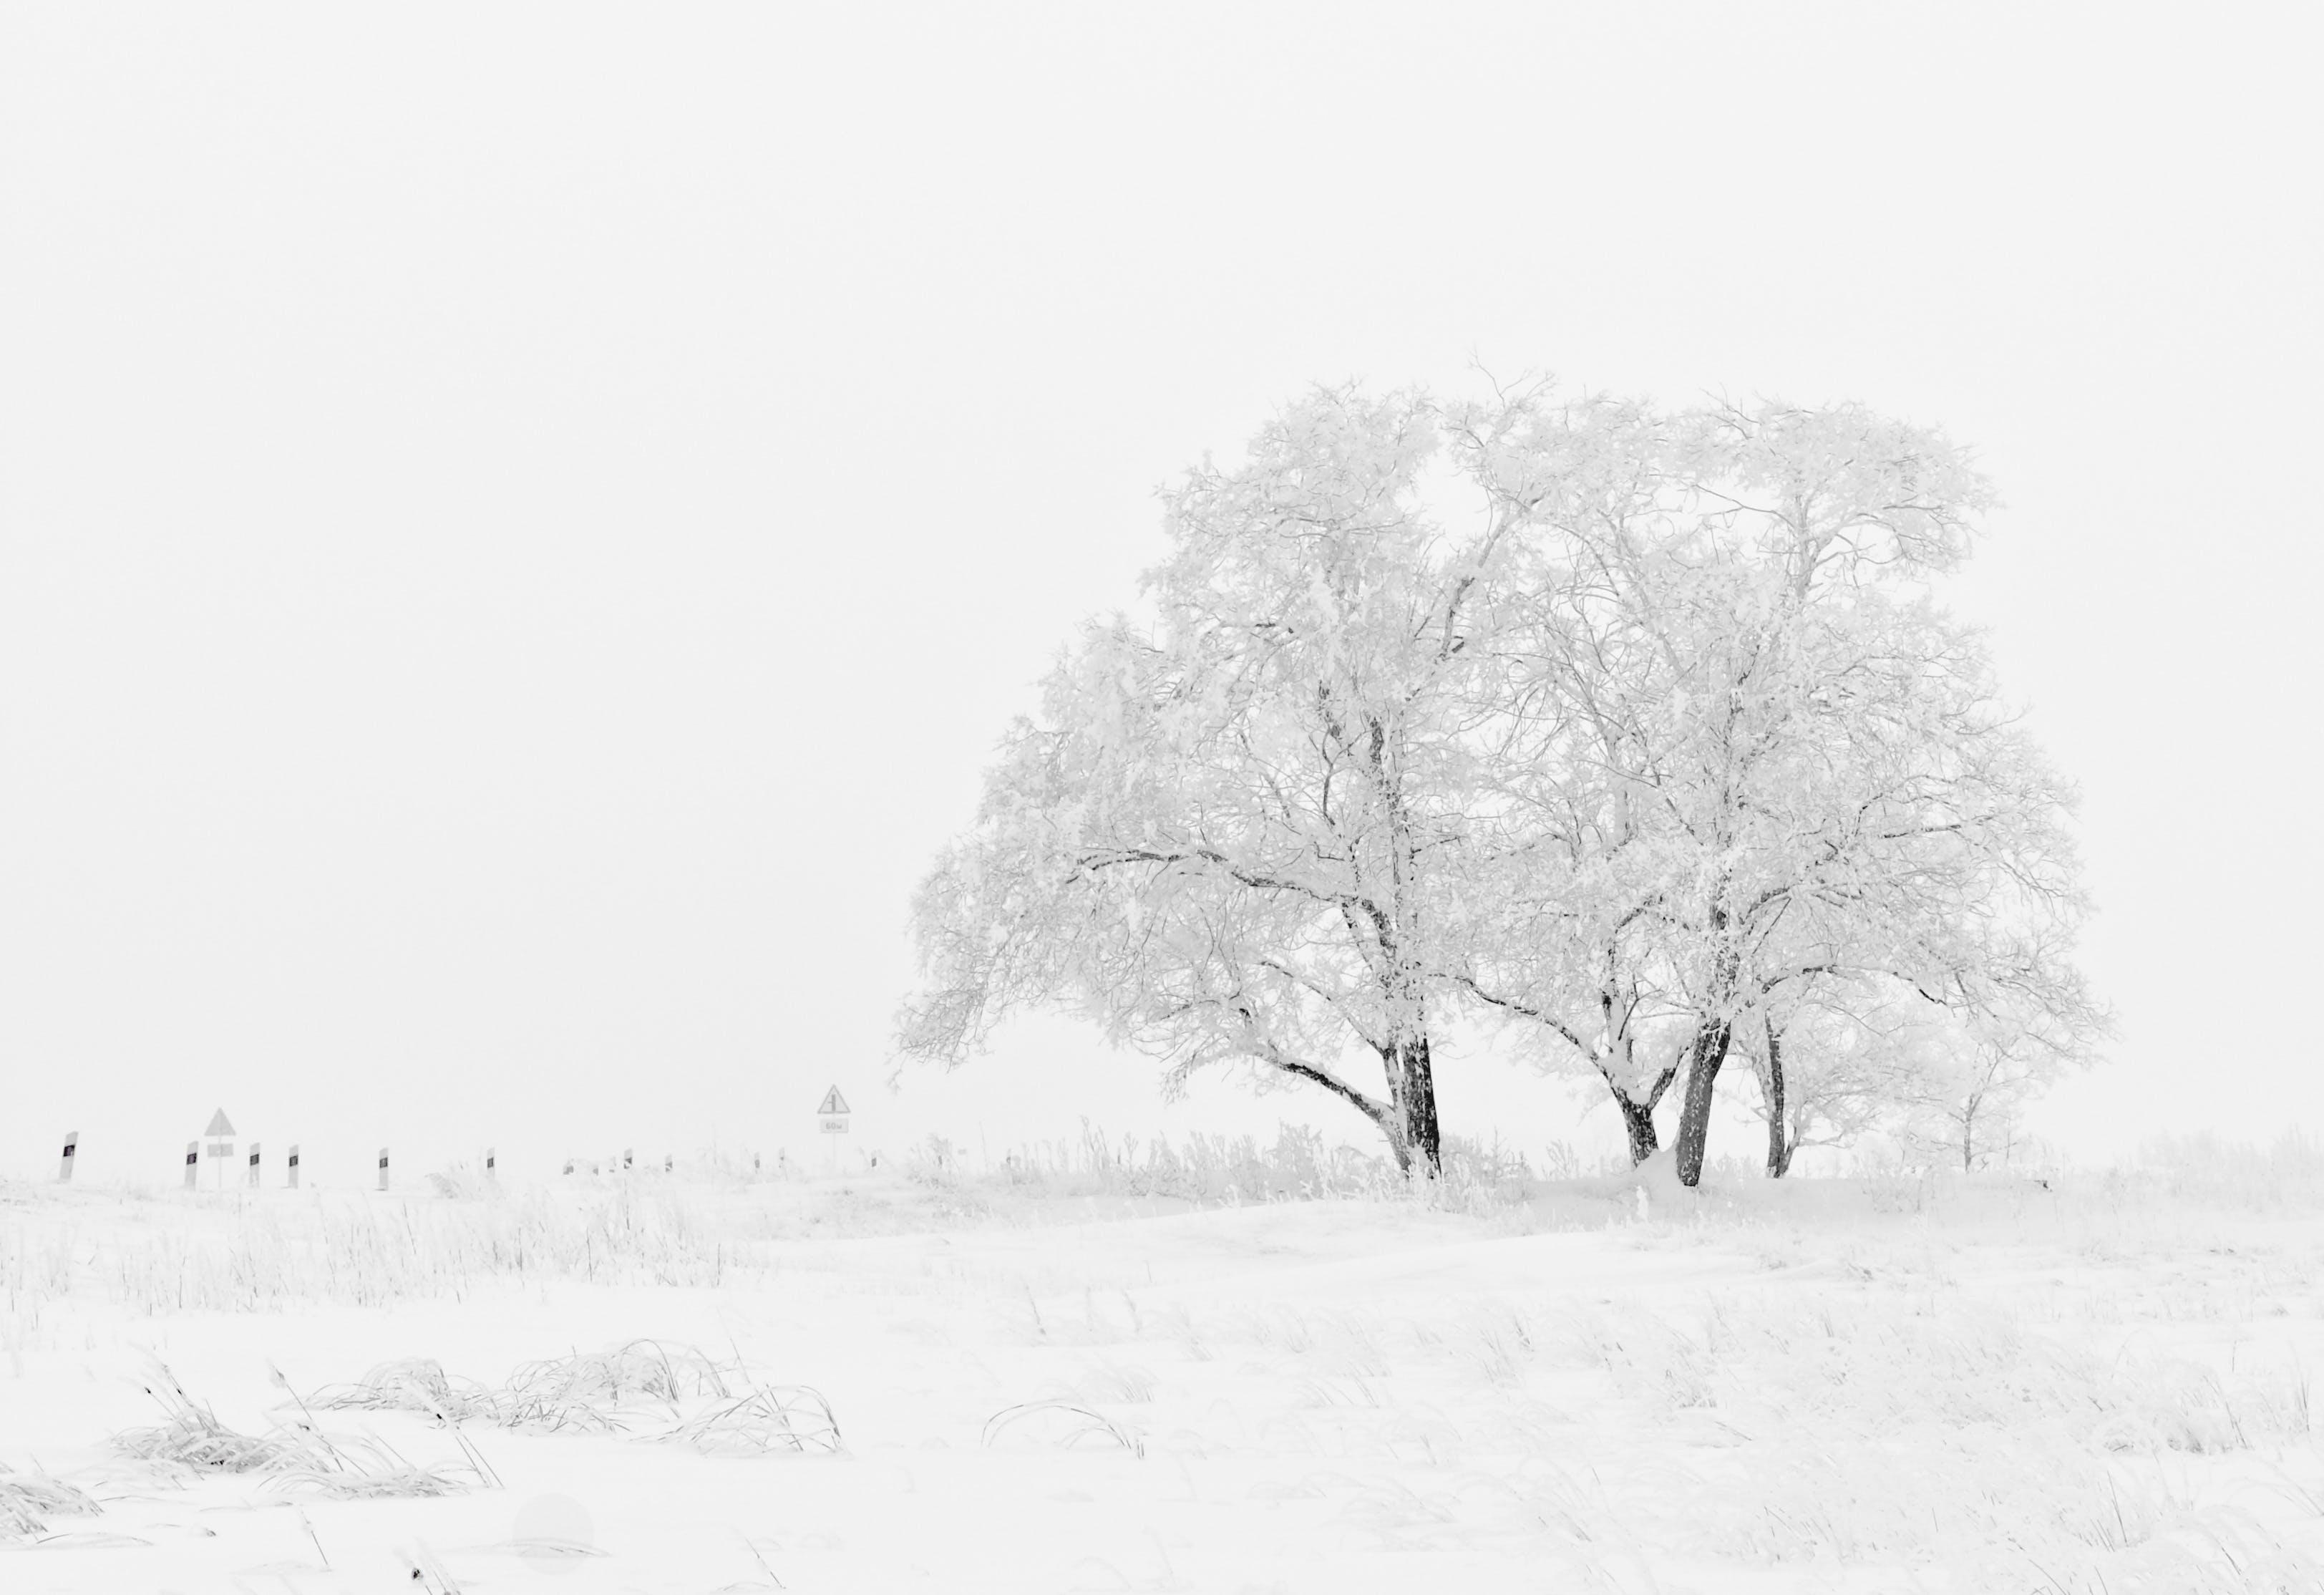 White and Black Tree Illustration